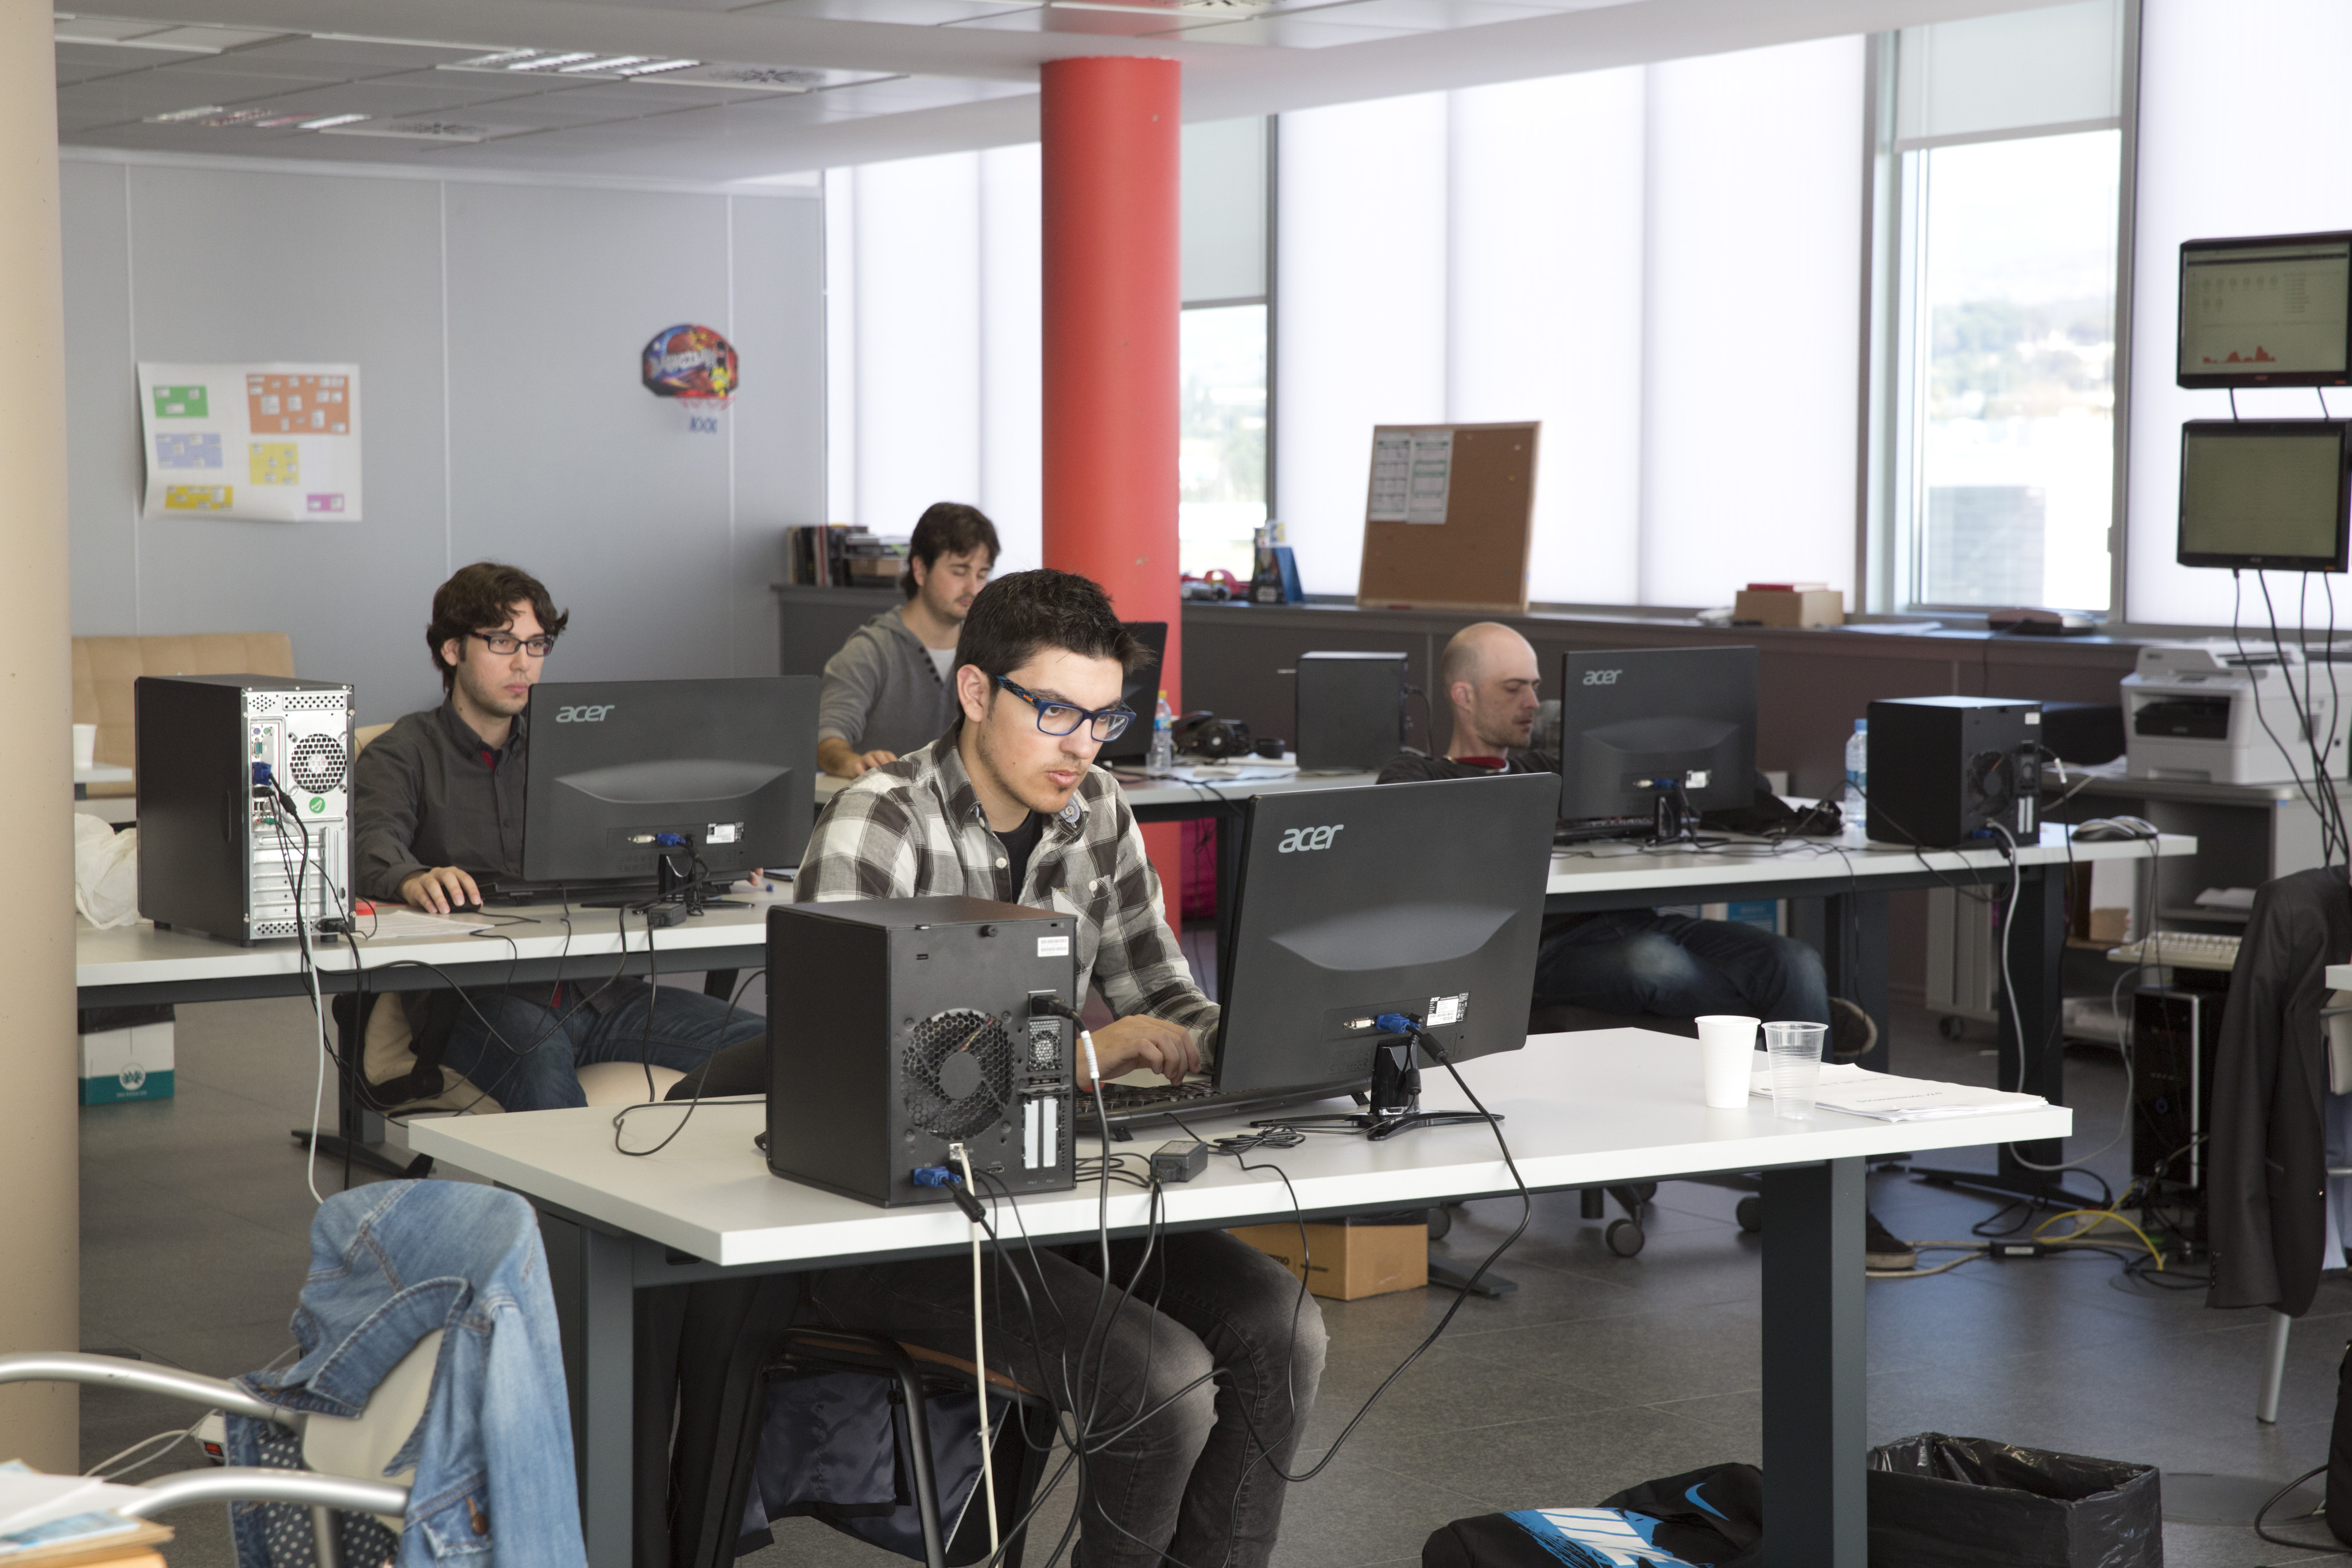 Oficina-espaitec-2-Paynopain